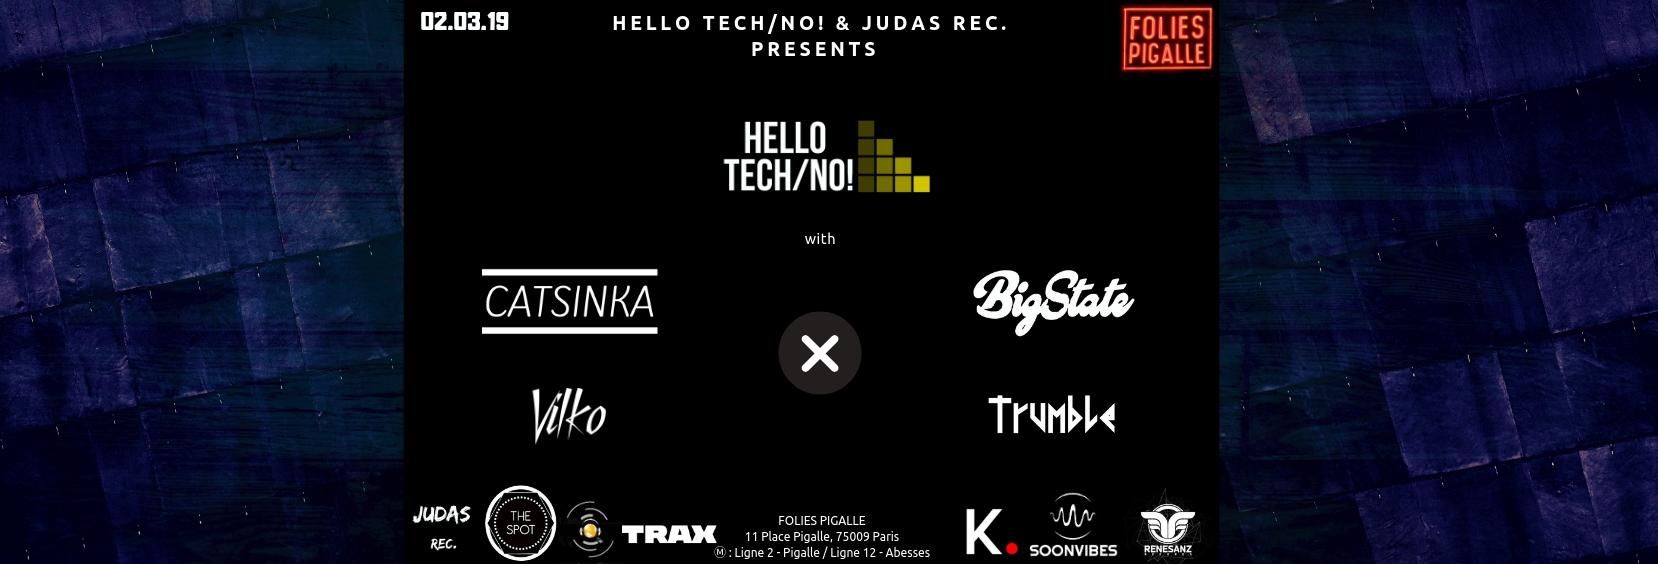 Hello Tech/No! - Catsinka x Bigstate x Vilko x Trumble at Folies Pigalle